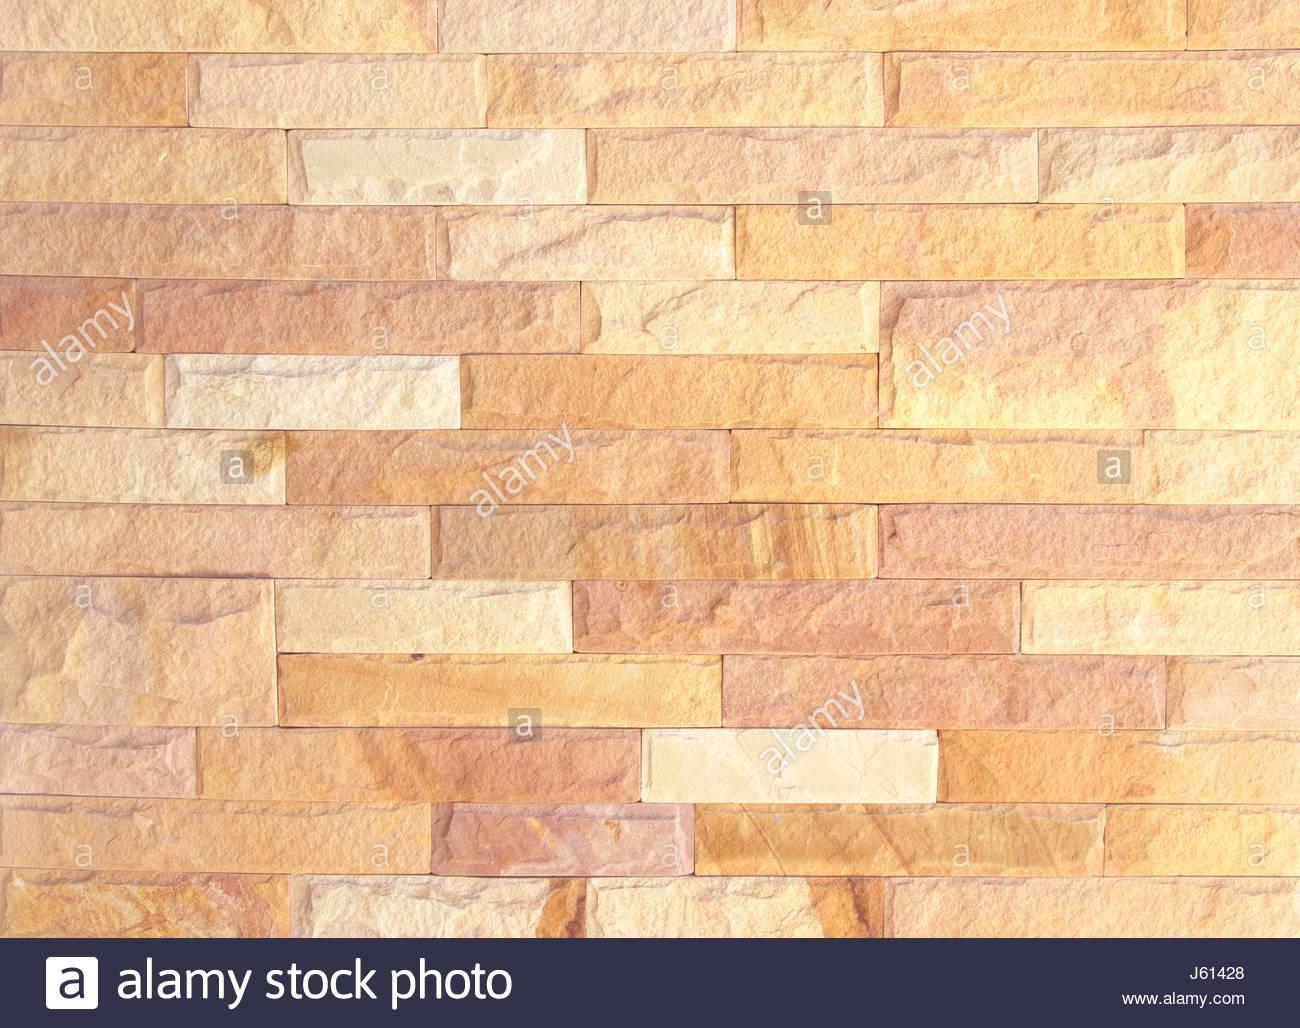 Famous Stone Wall Panels Decorative Ideas - All About Wallart ...